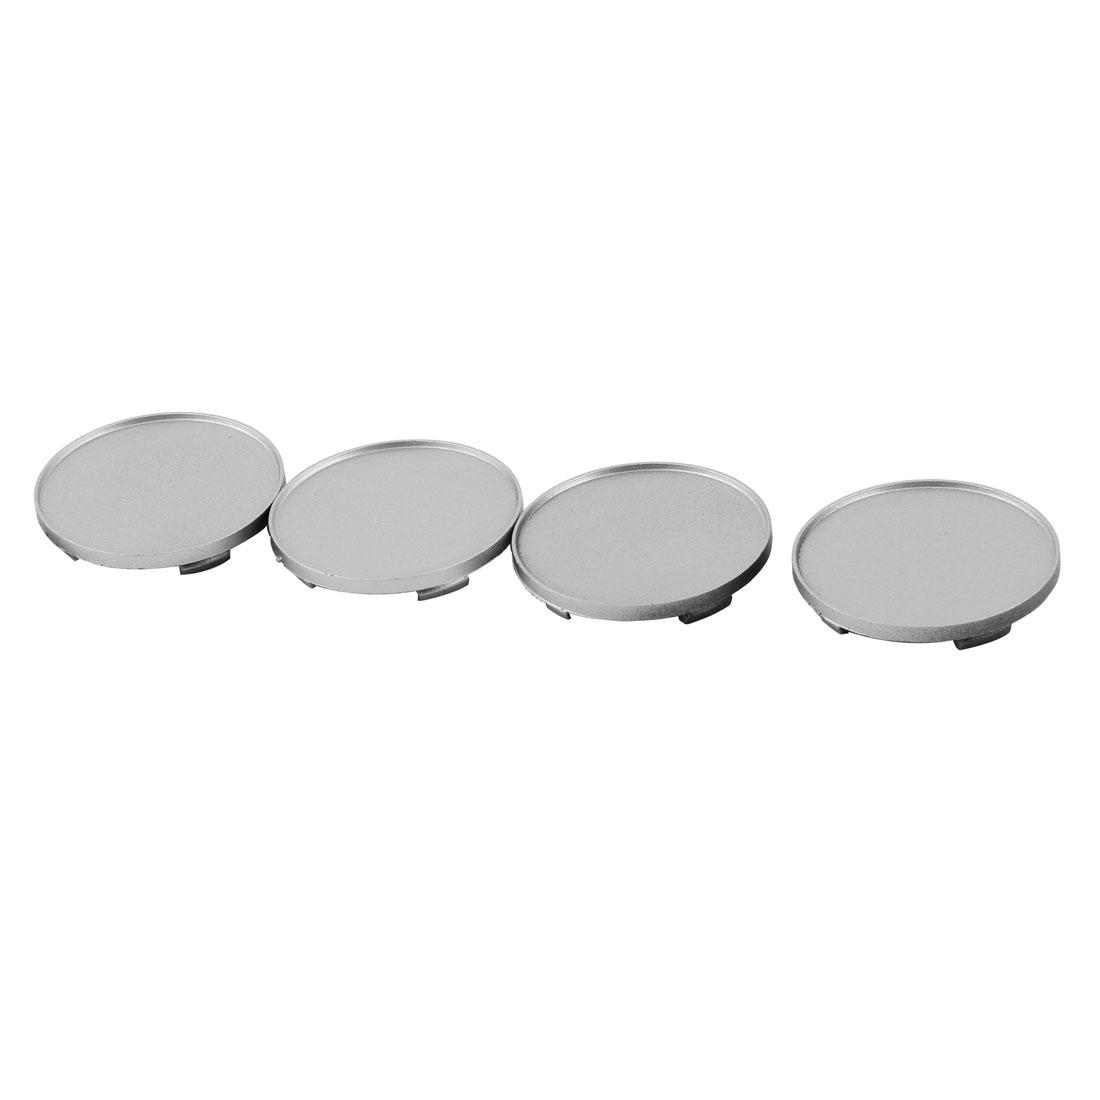 62mm Diameter Plastic Car Auto Wheel Center Hub Cap Cover Silver Tone 4pcs